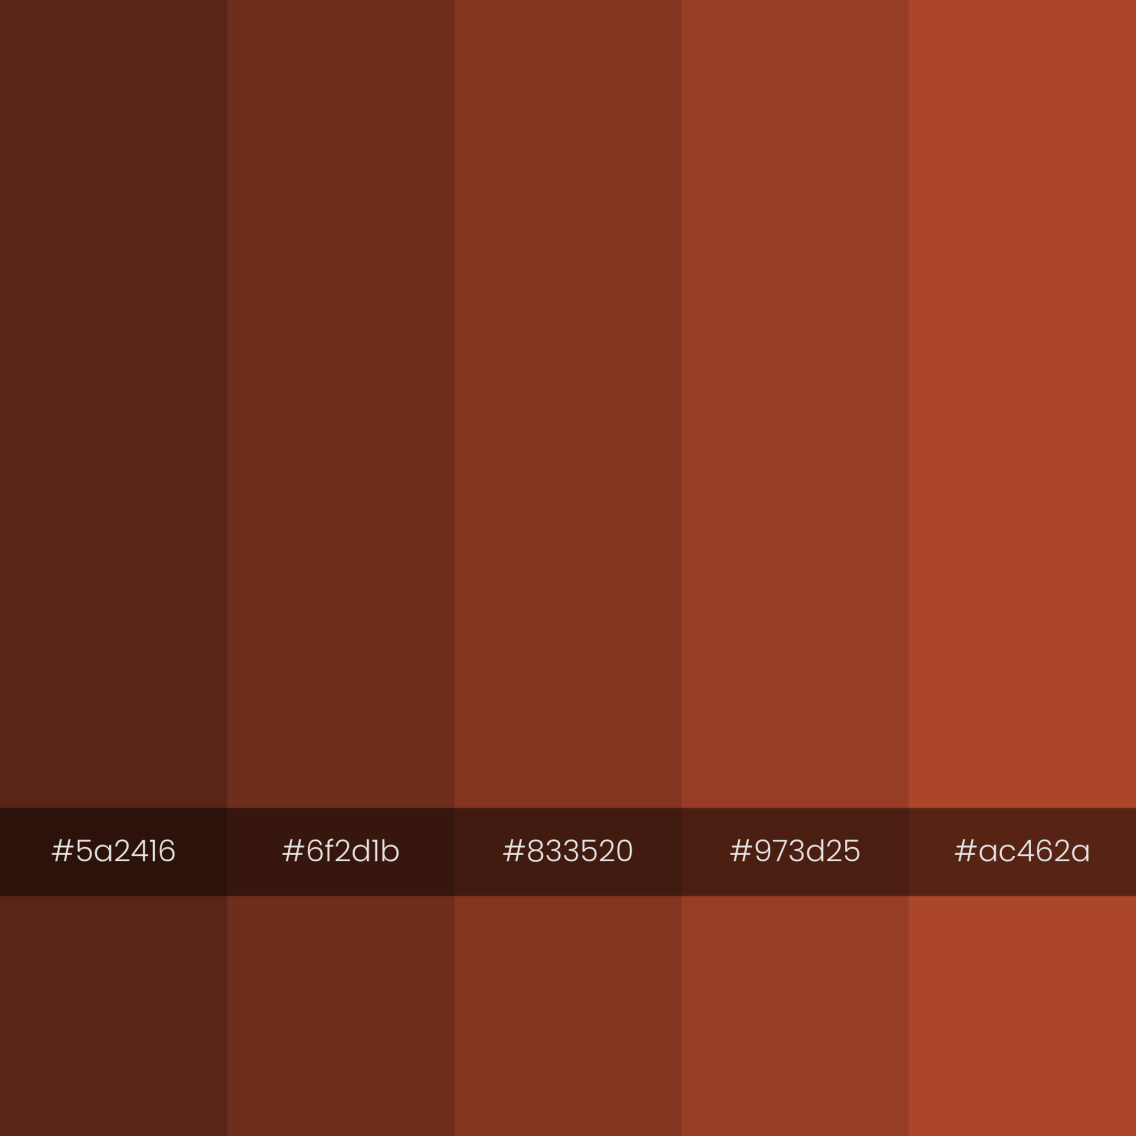 color-palette-2000-2000-troglodyte-monochrome